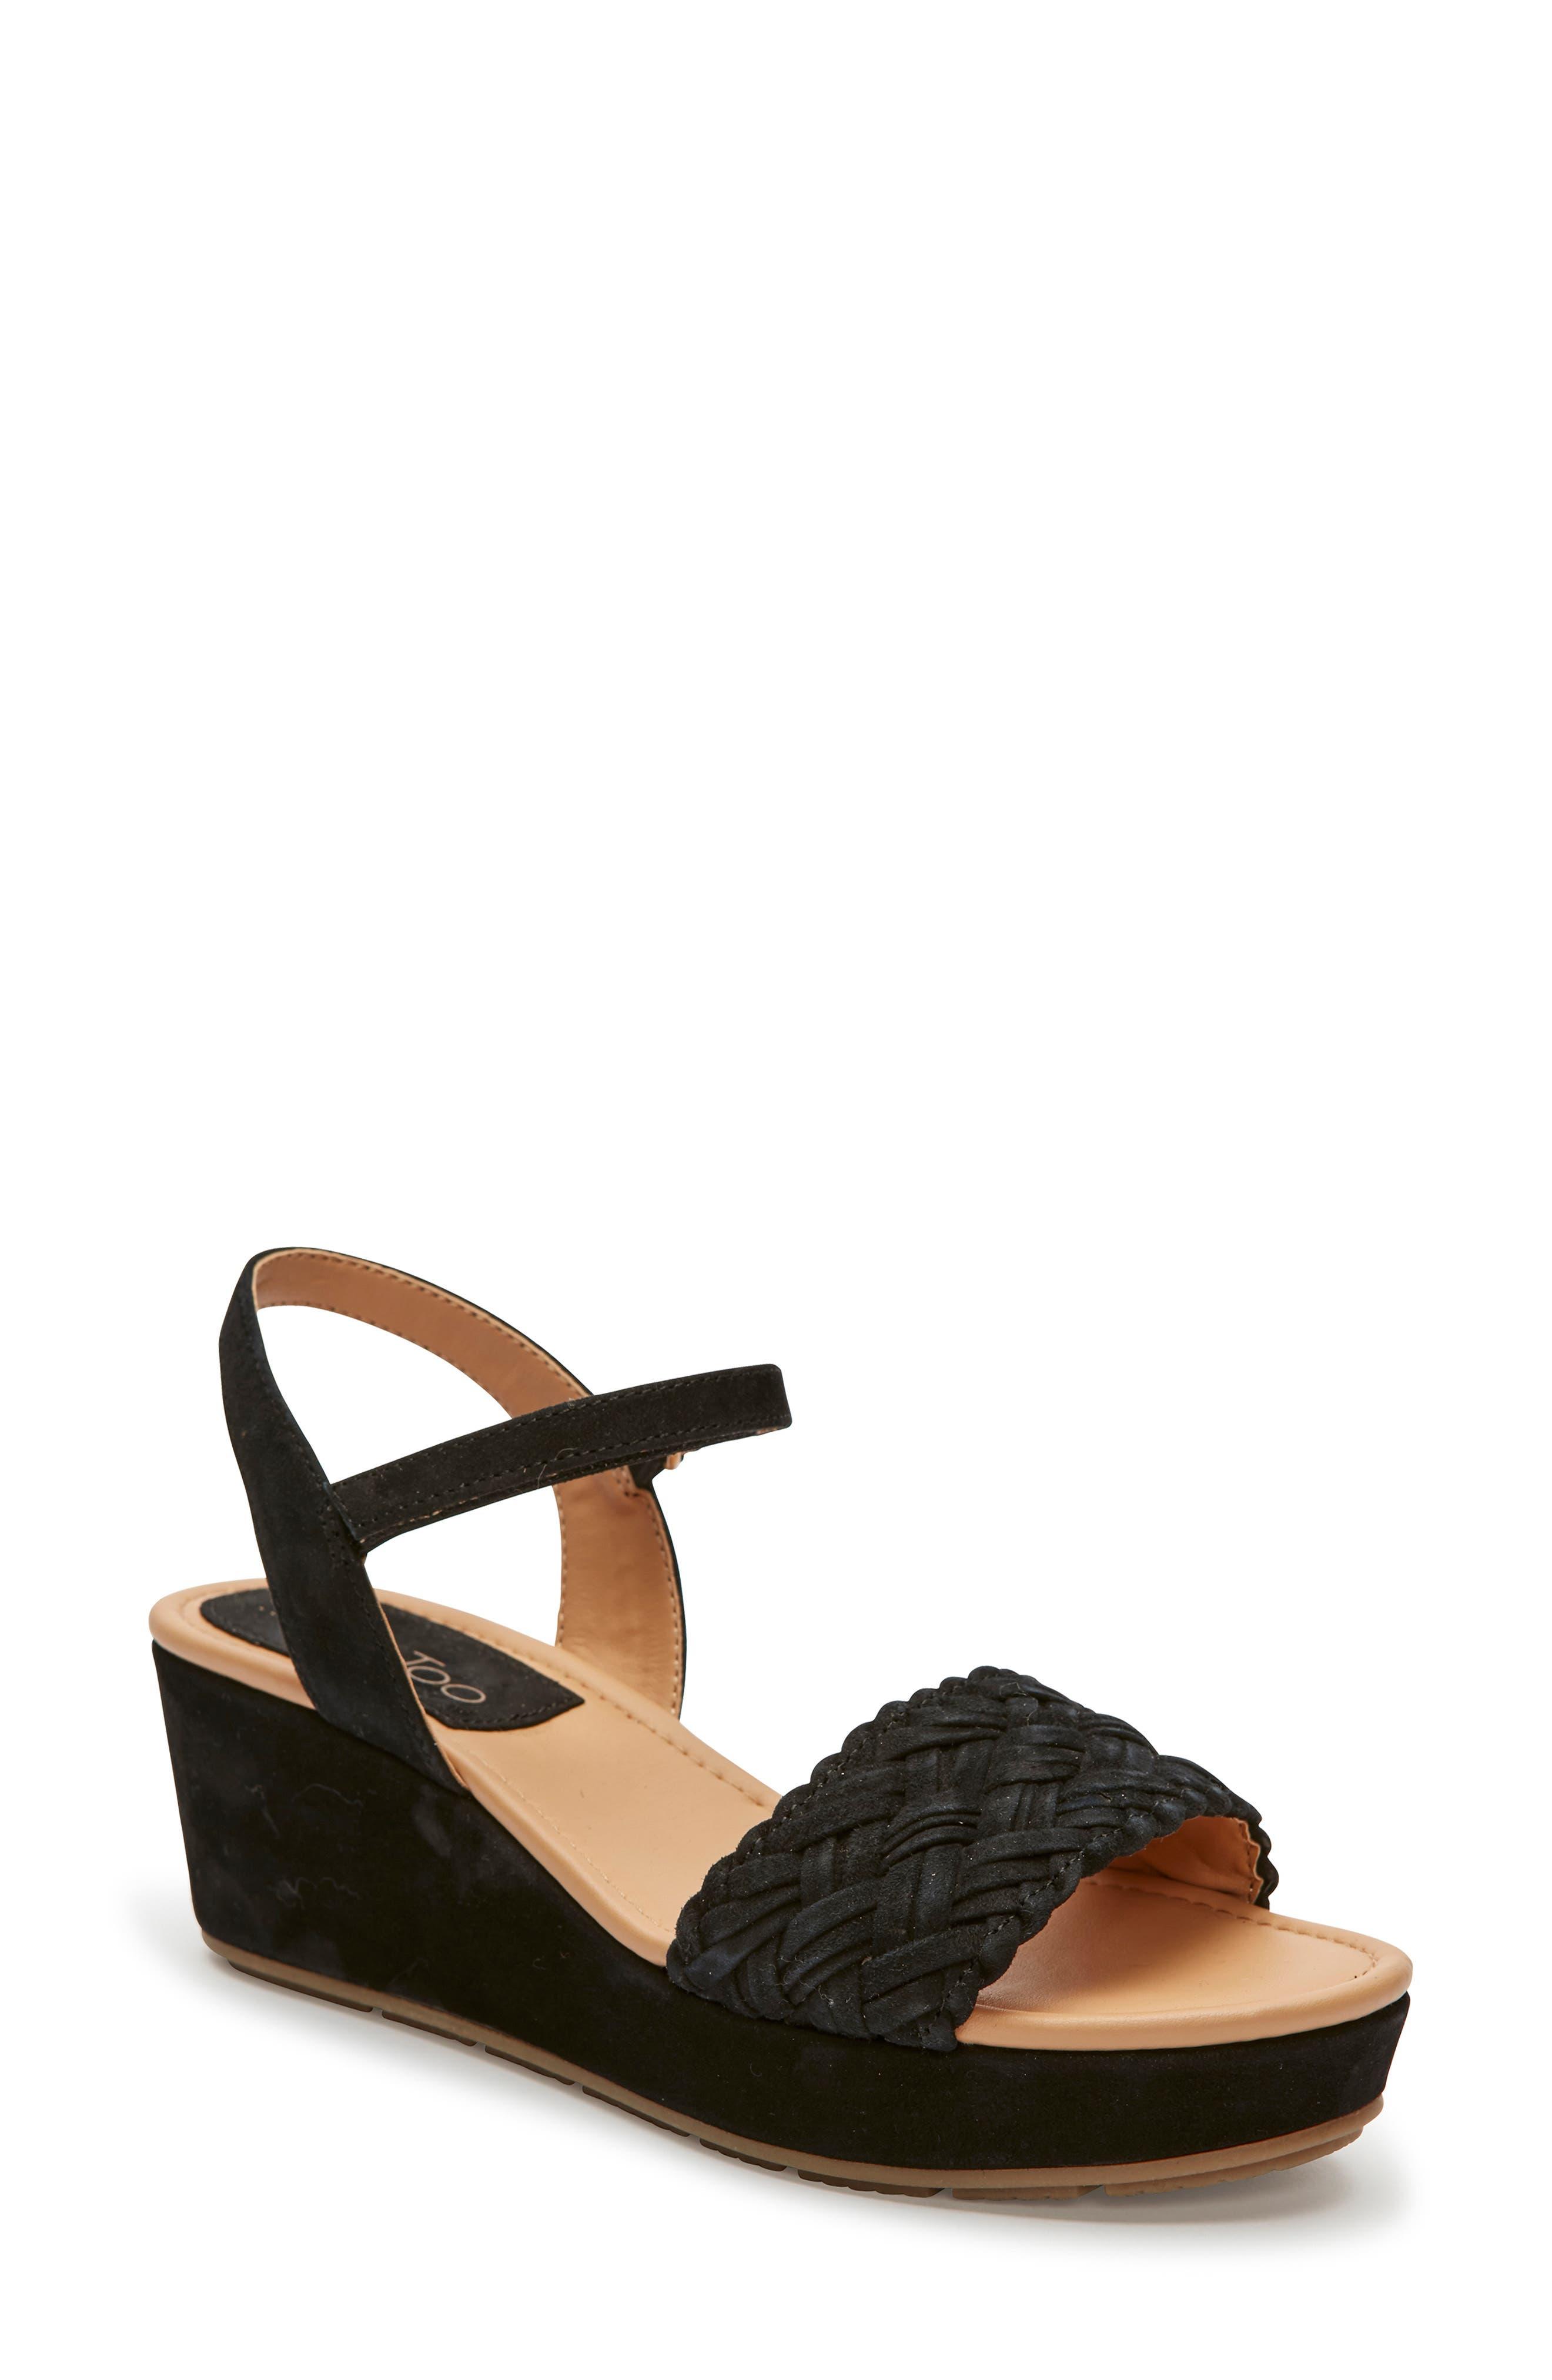 Abella Wedge Sandal, Main, color, BLACK SUEDE